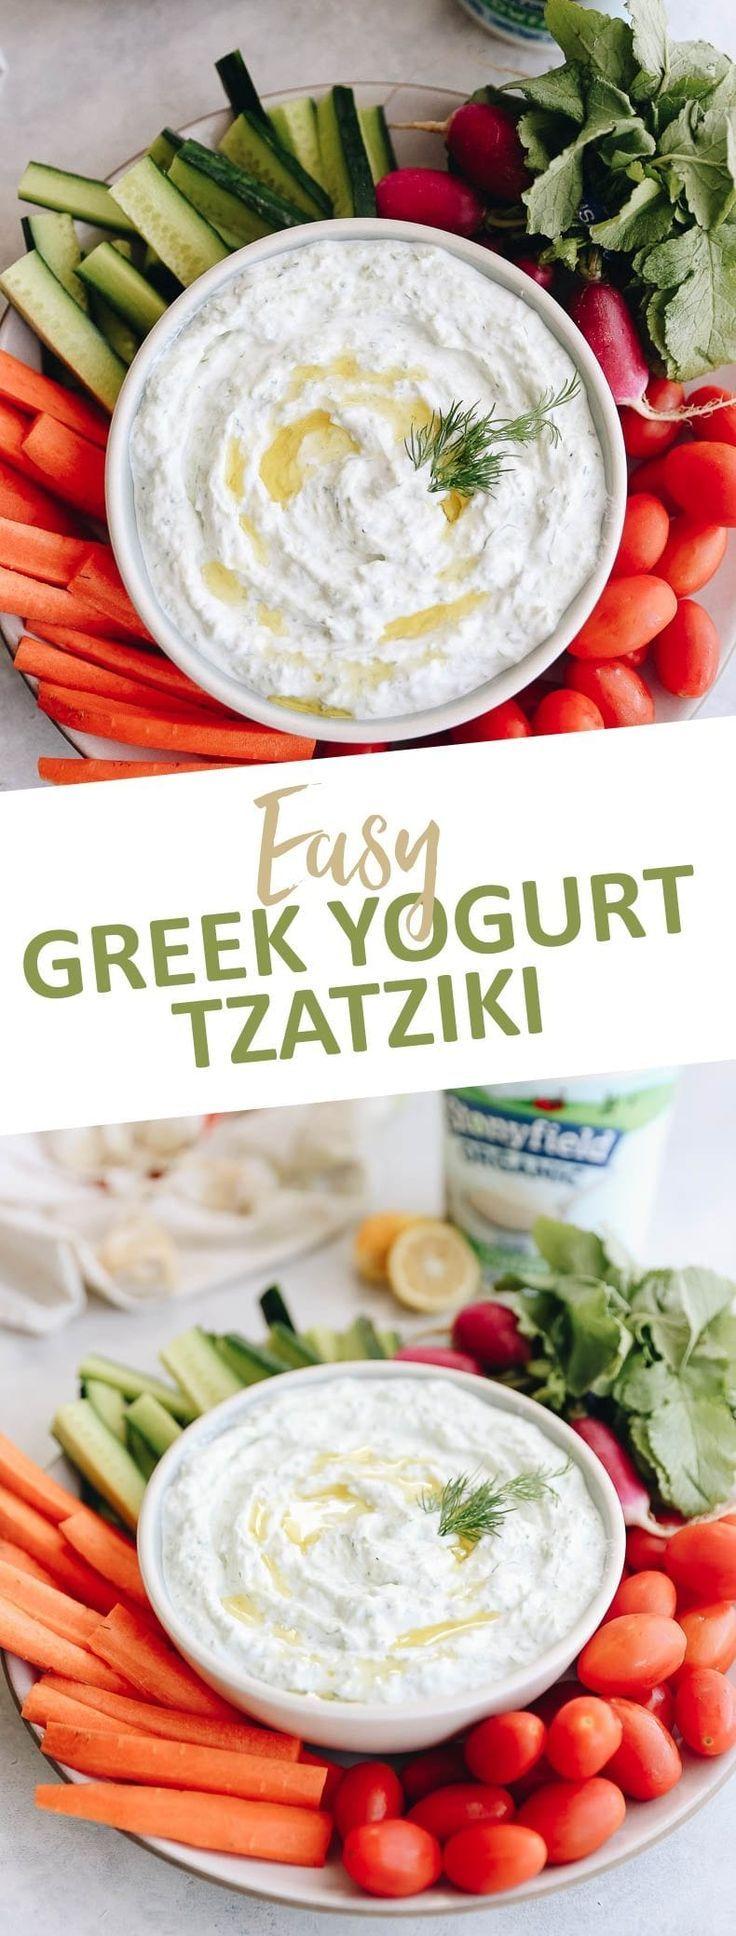 Easy greek yogurt tzatziki dip the healthy maven greek